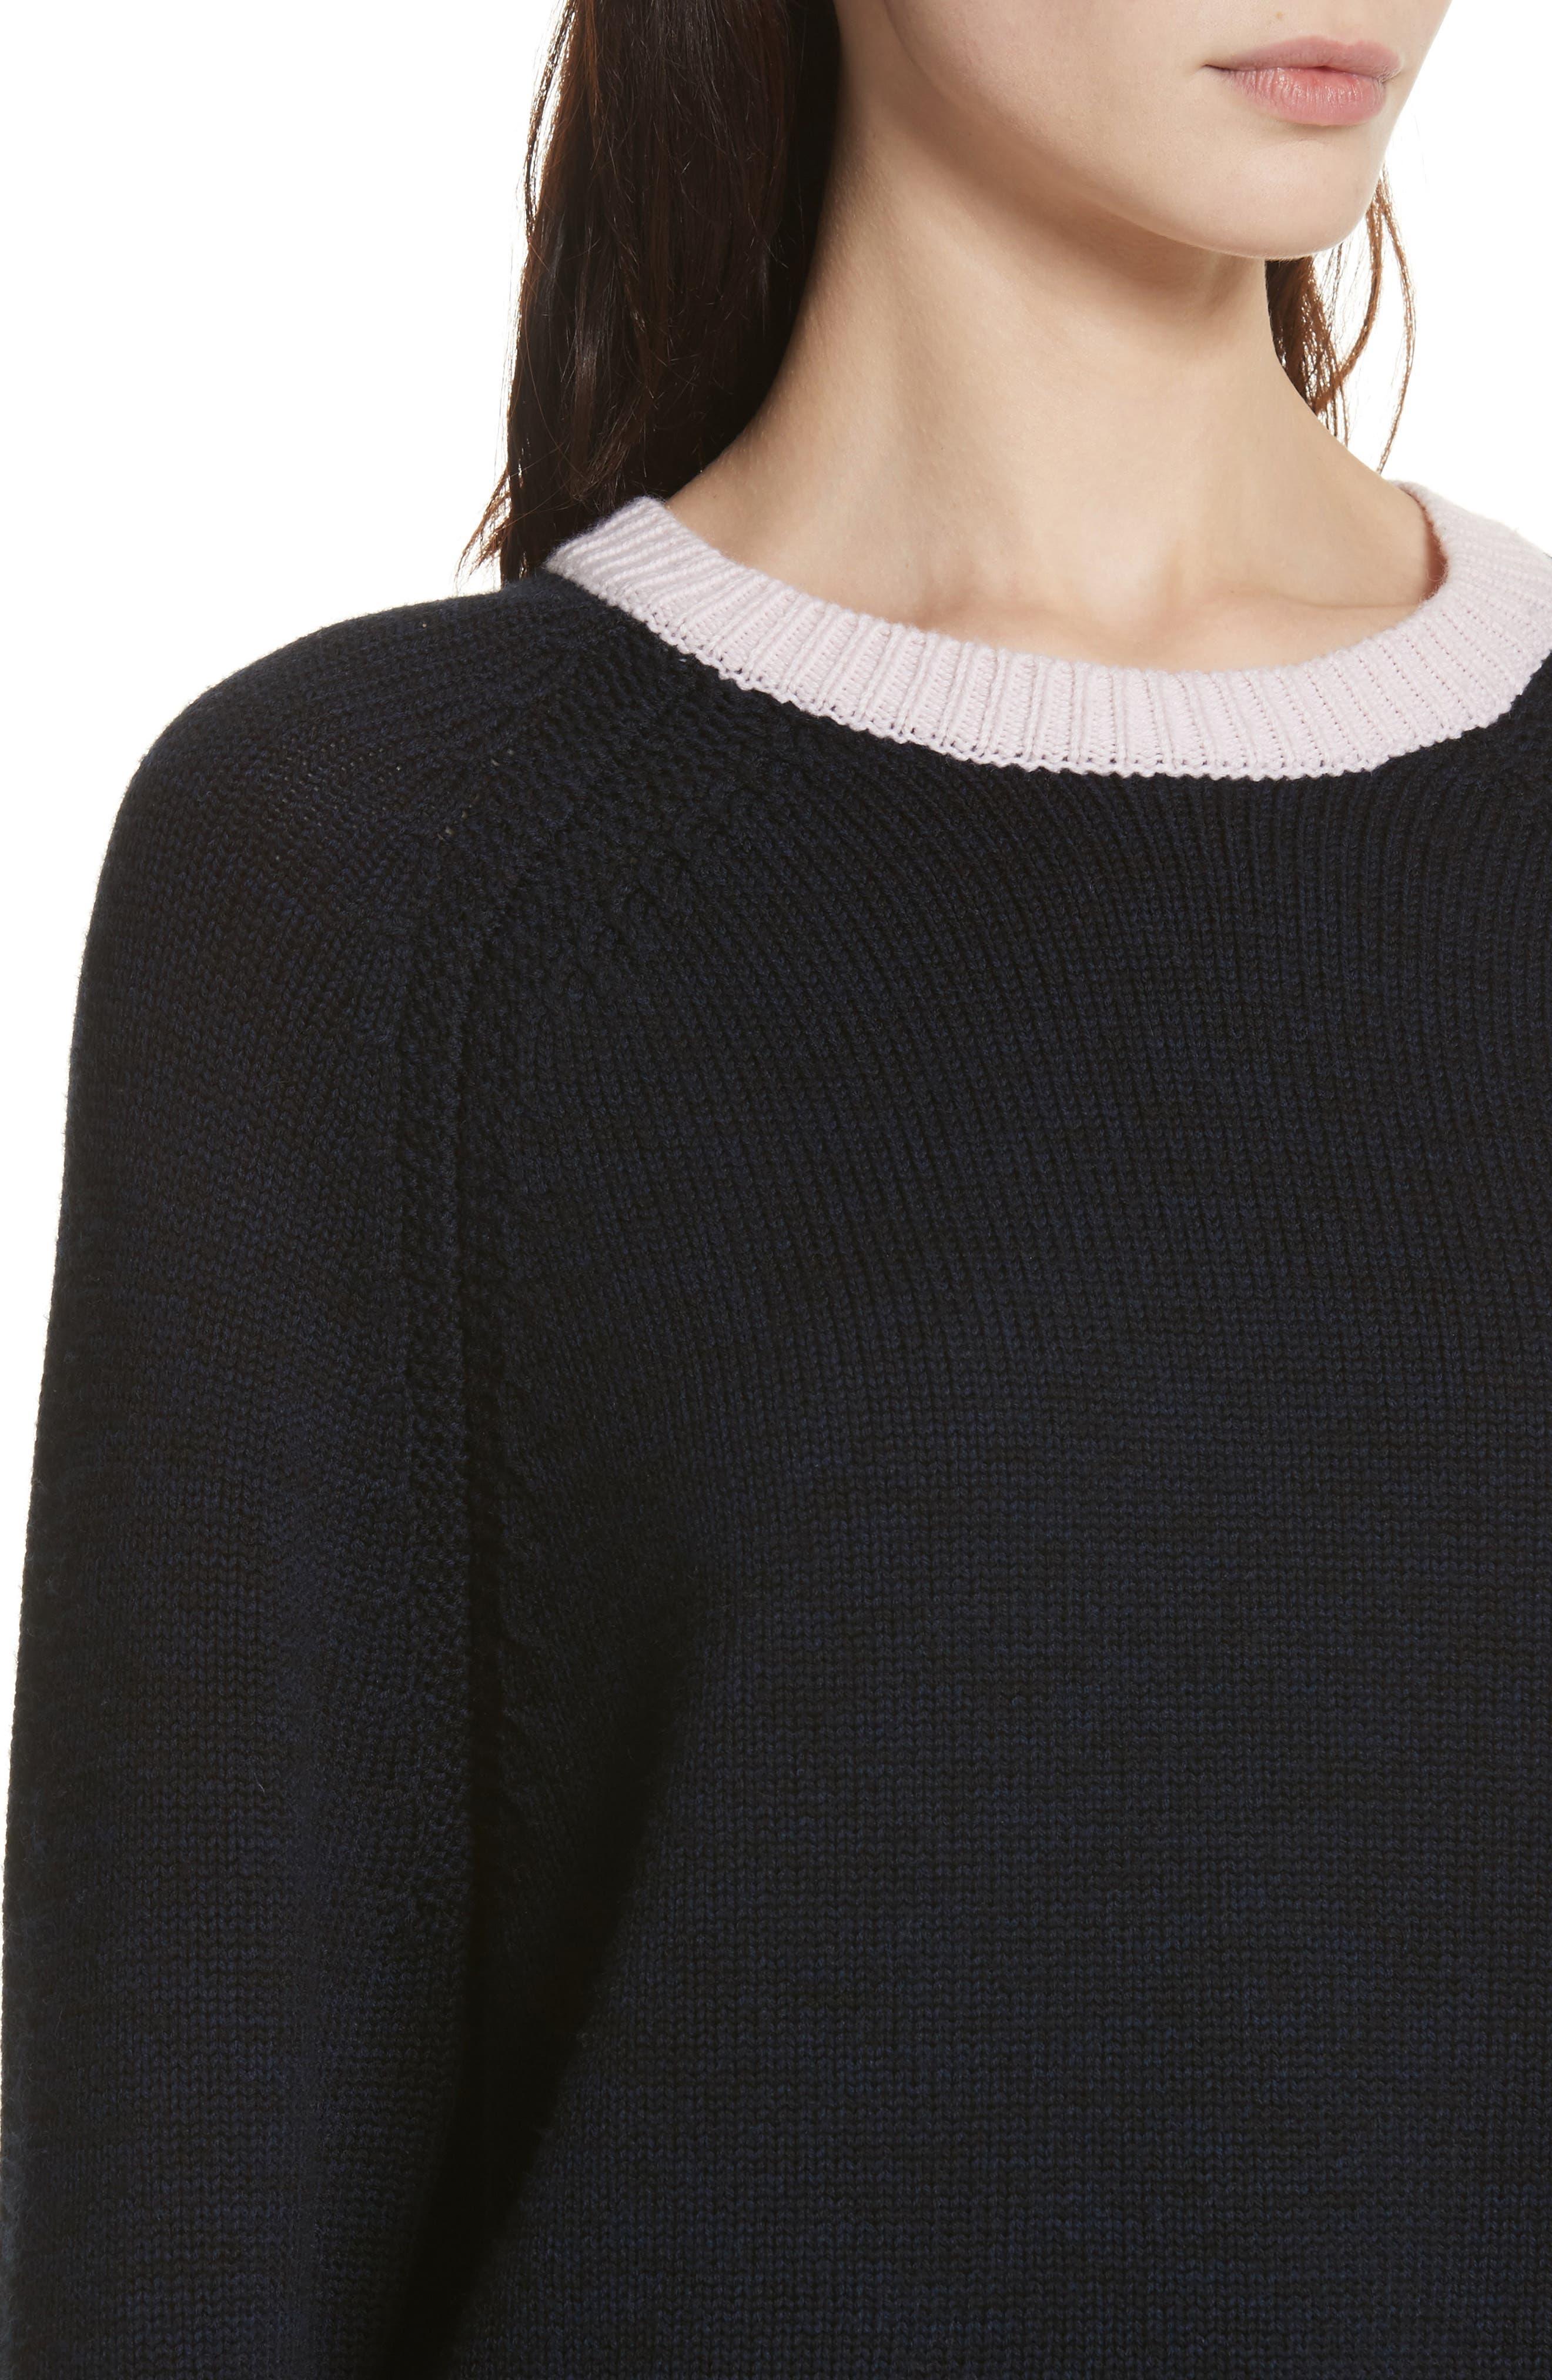 Hattie Crewneck Merino Wool Sweater,                             Alternate thumbnail 4, color,